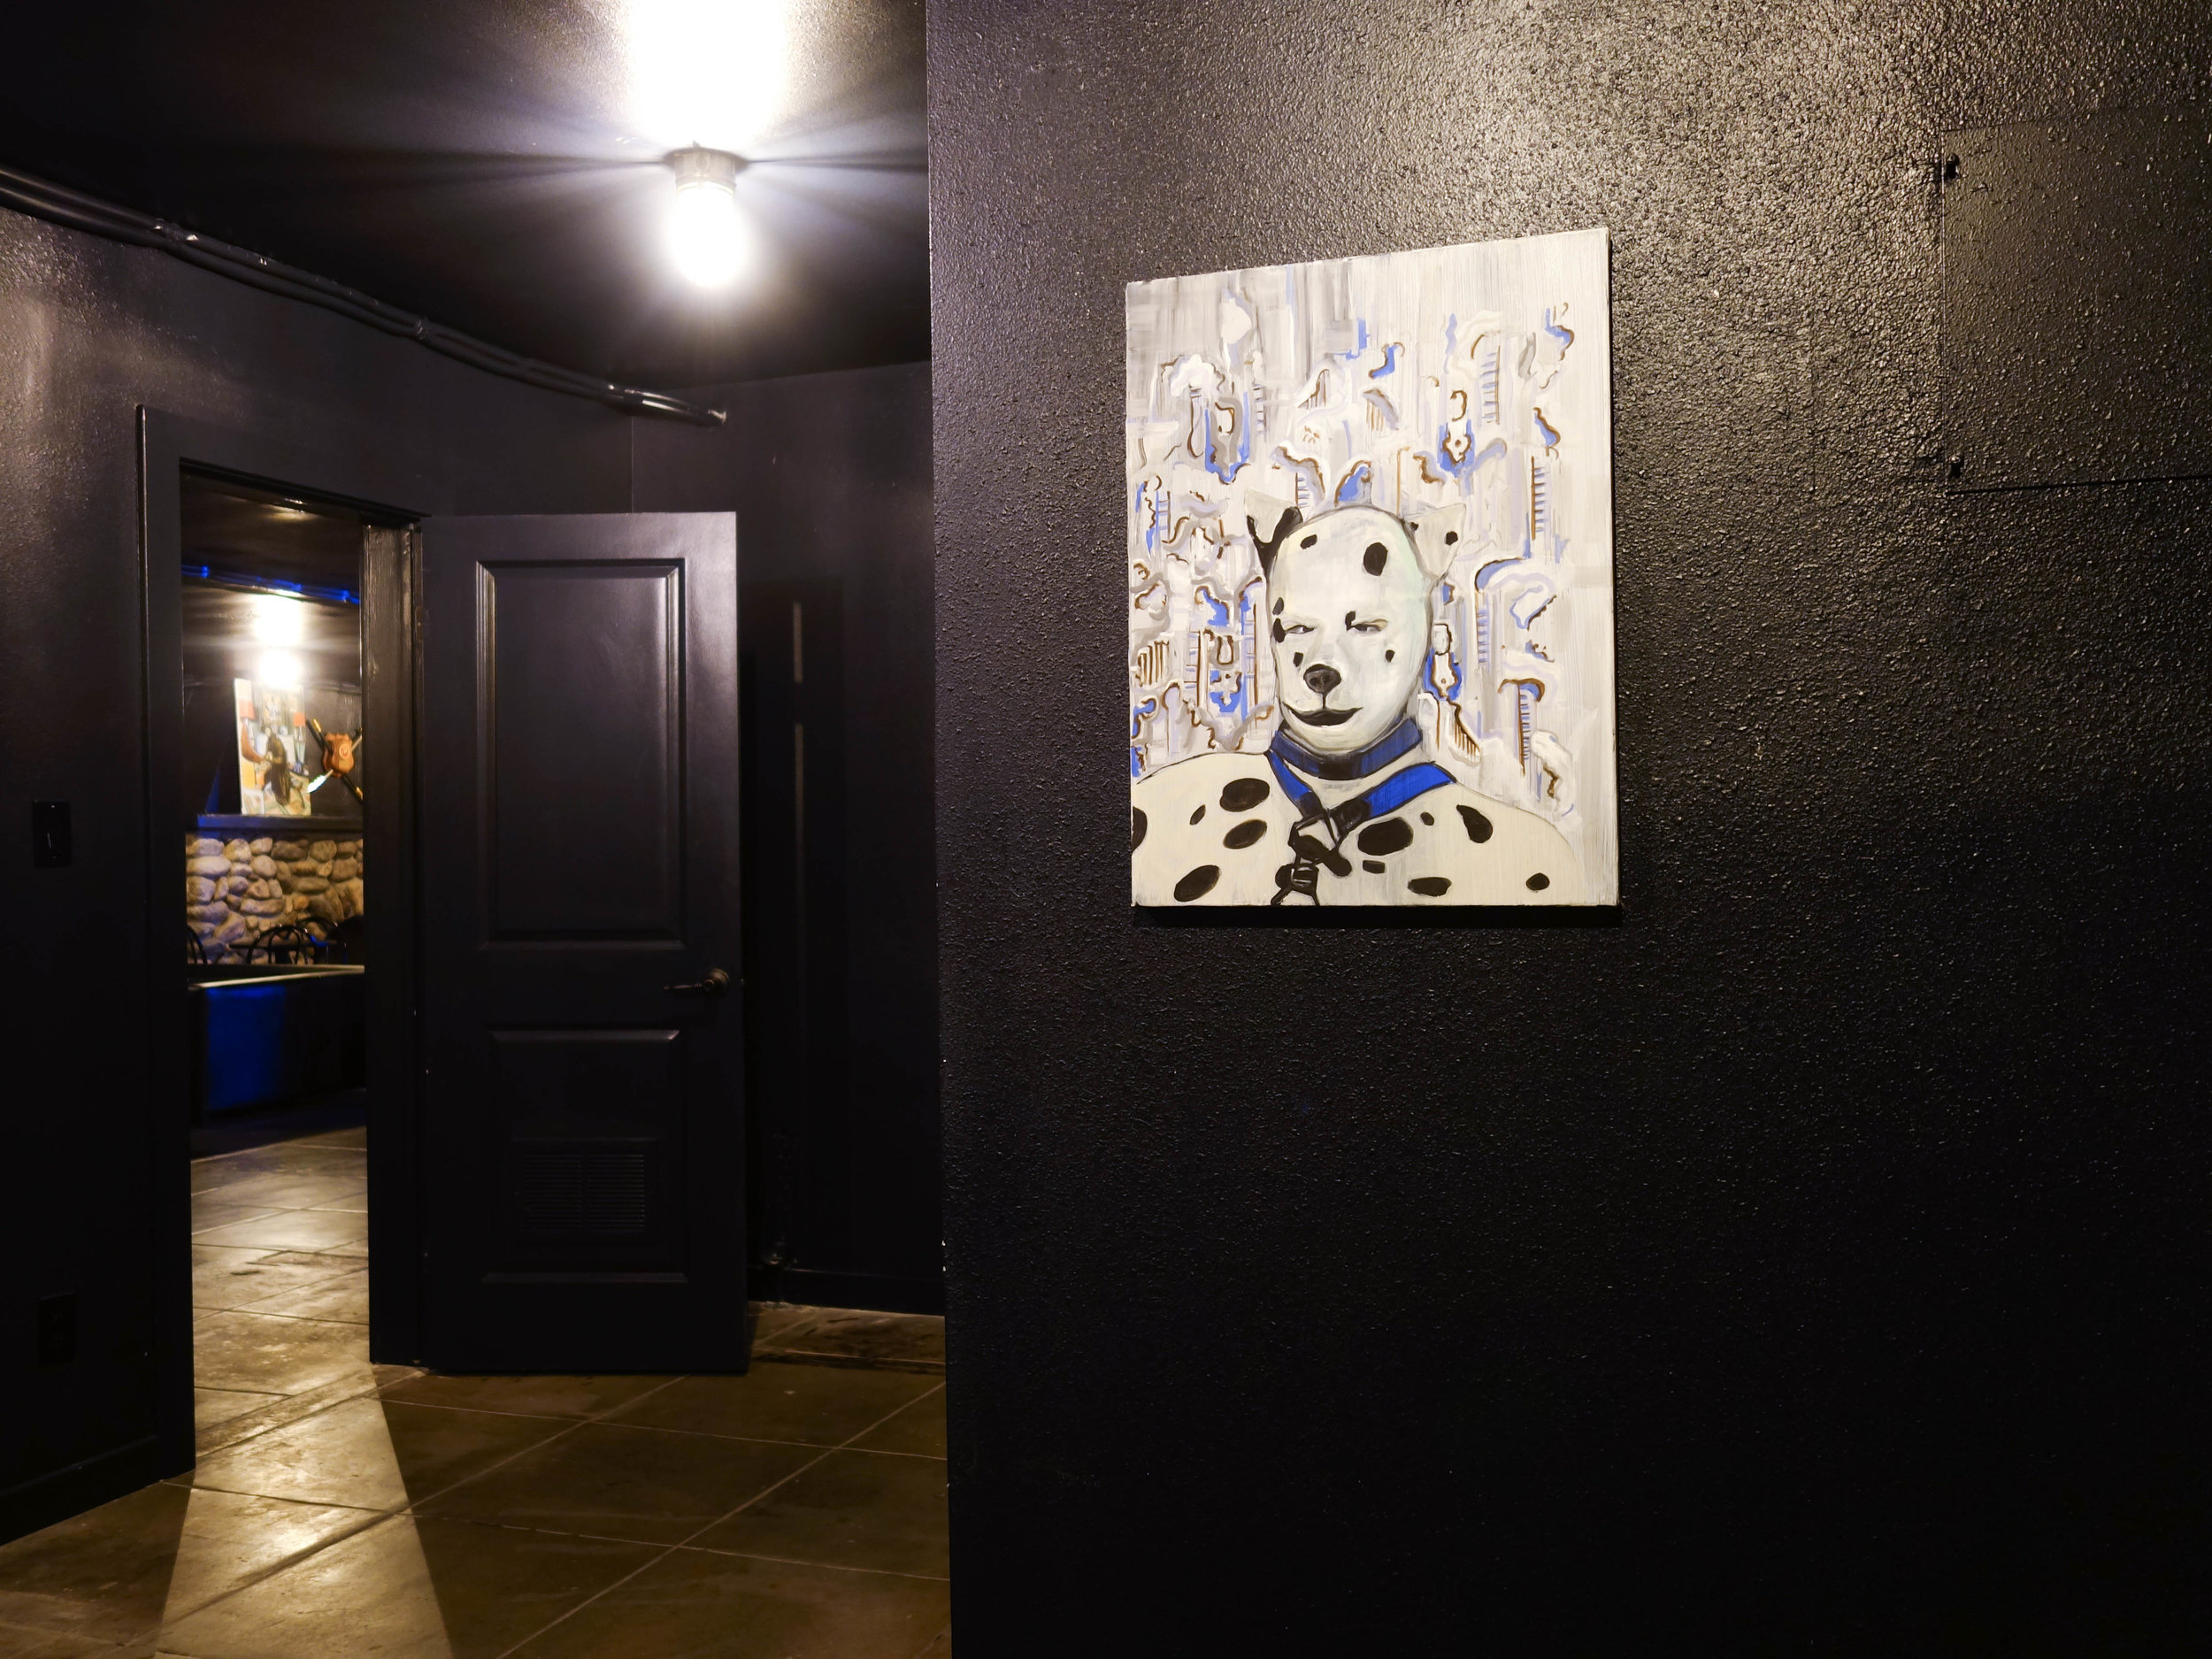 Powder Puff Puppy Man , 2017. Oil on canvas. 24 in. x 18 in. (60.96 cm. x 45.72 cm.)